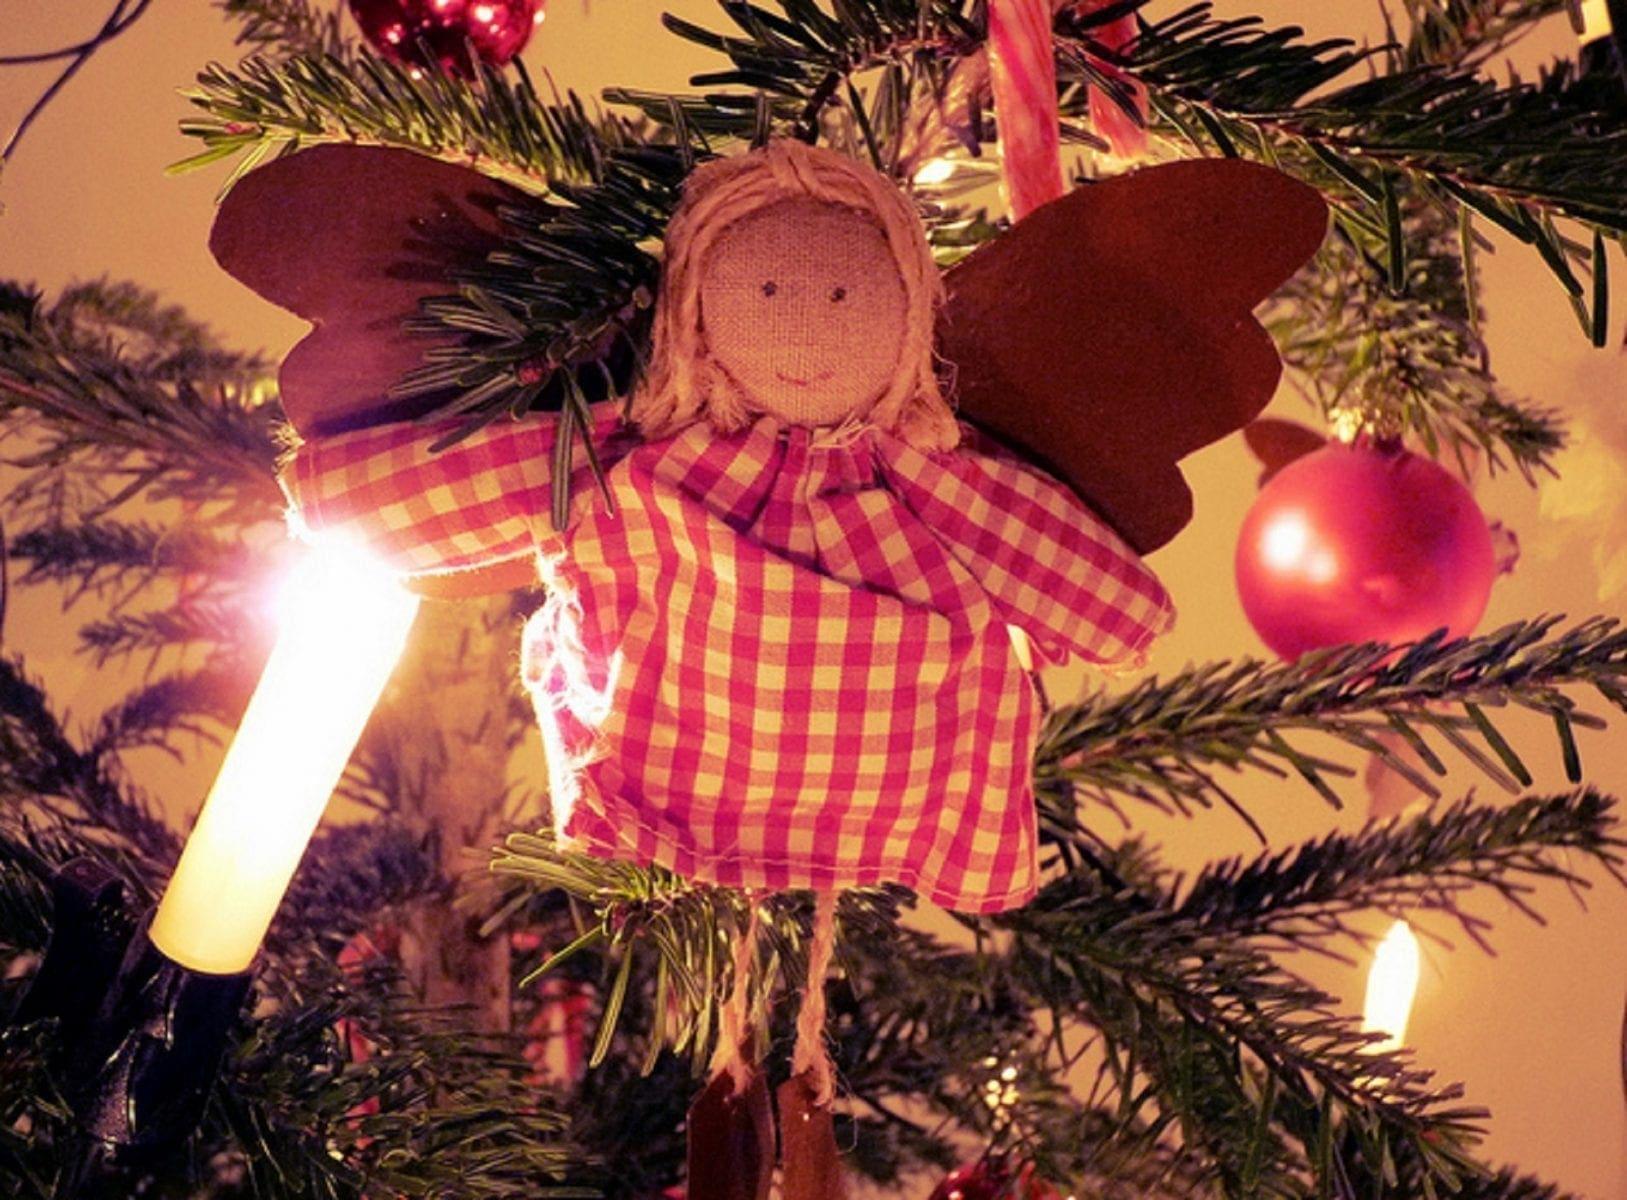 Christmas Germany St Nicholas Day